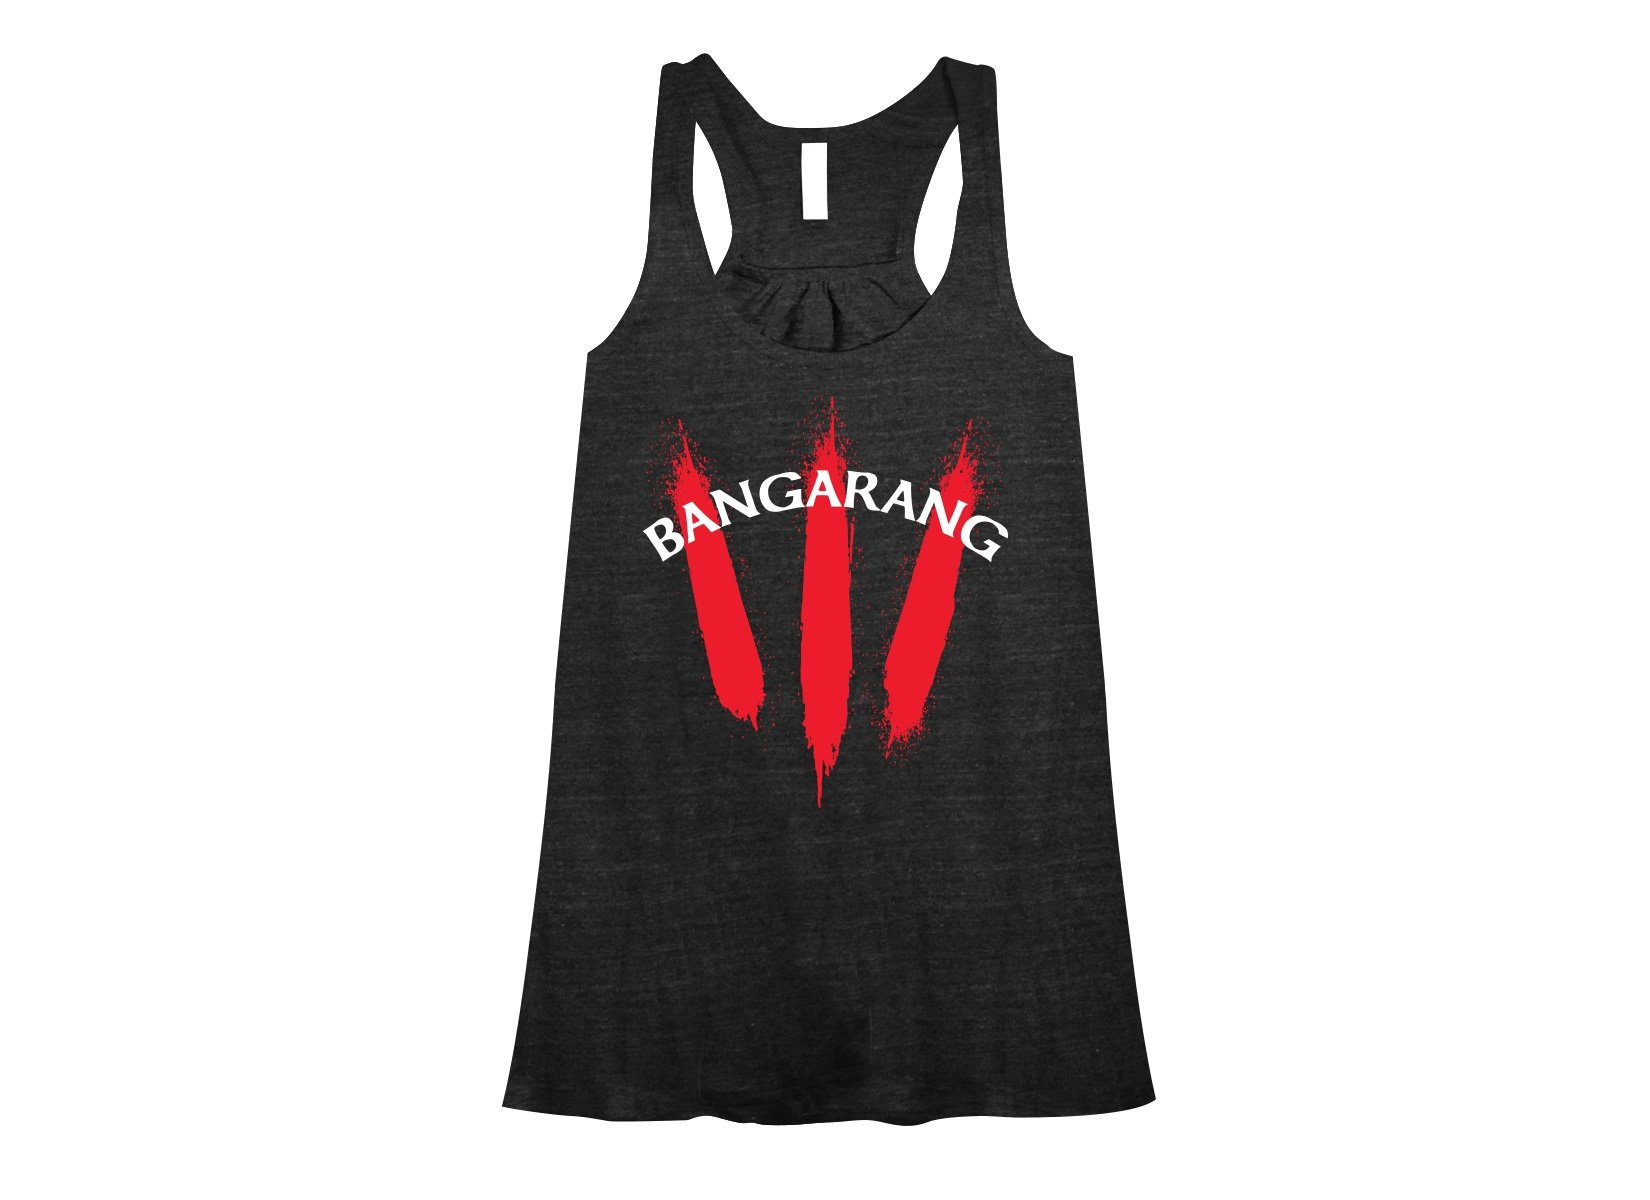 Bangarang on Womens Tanks T-Shirt